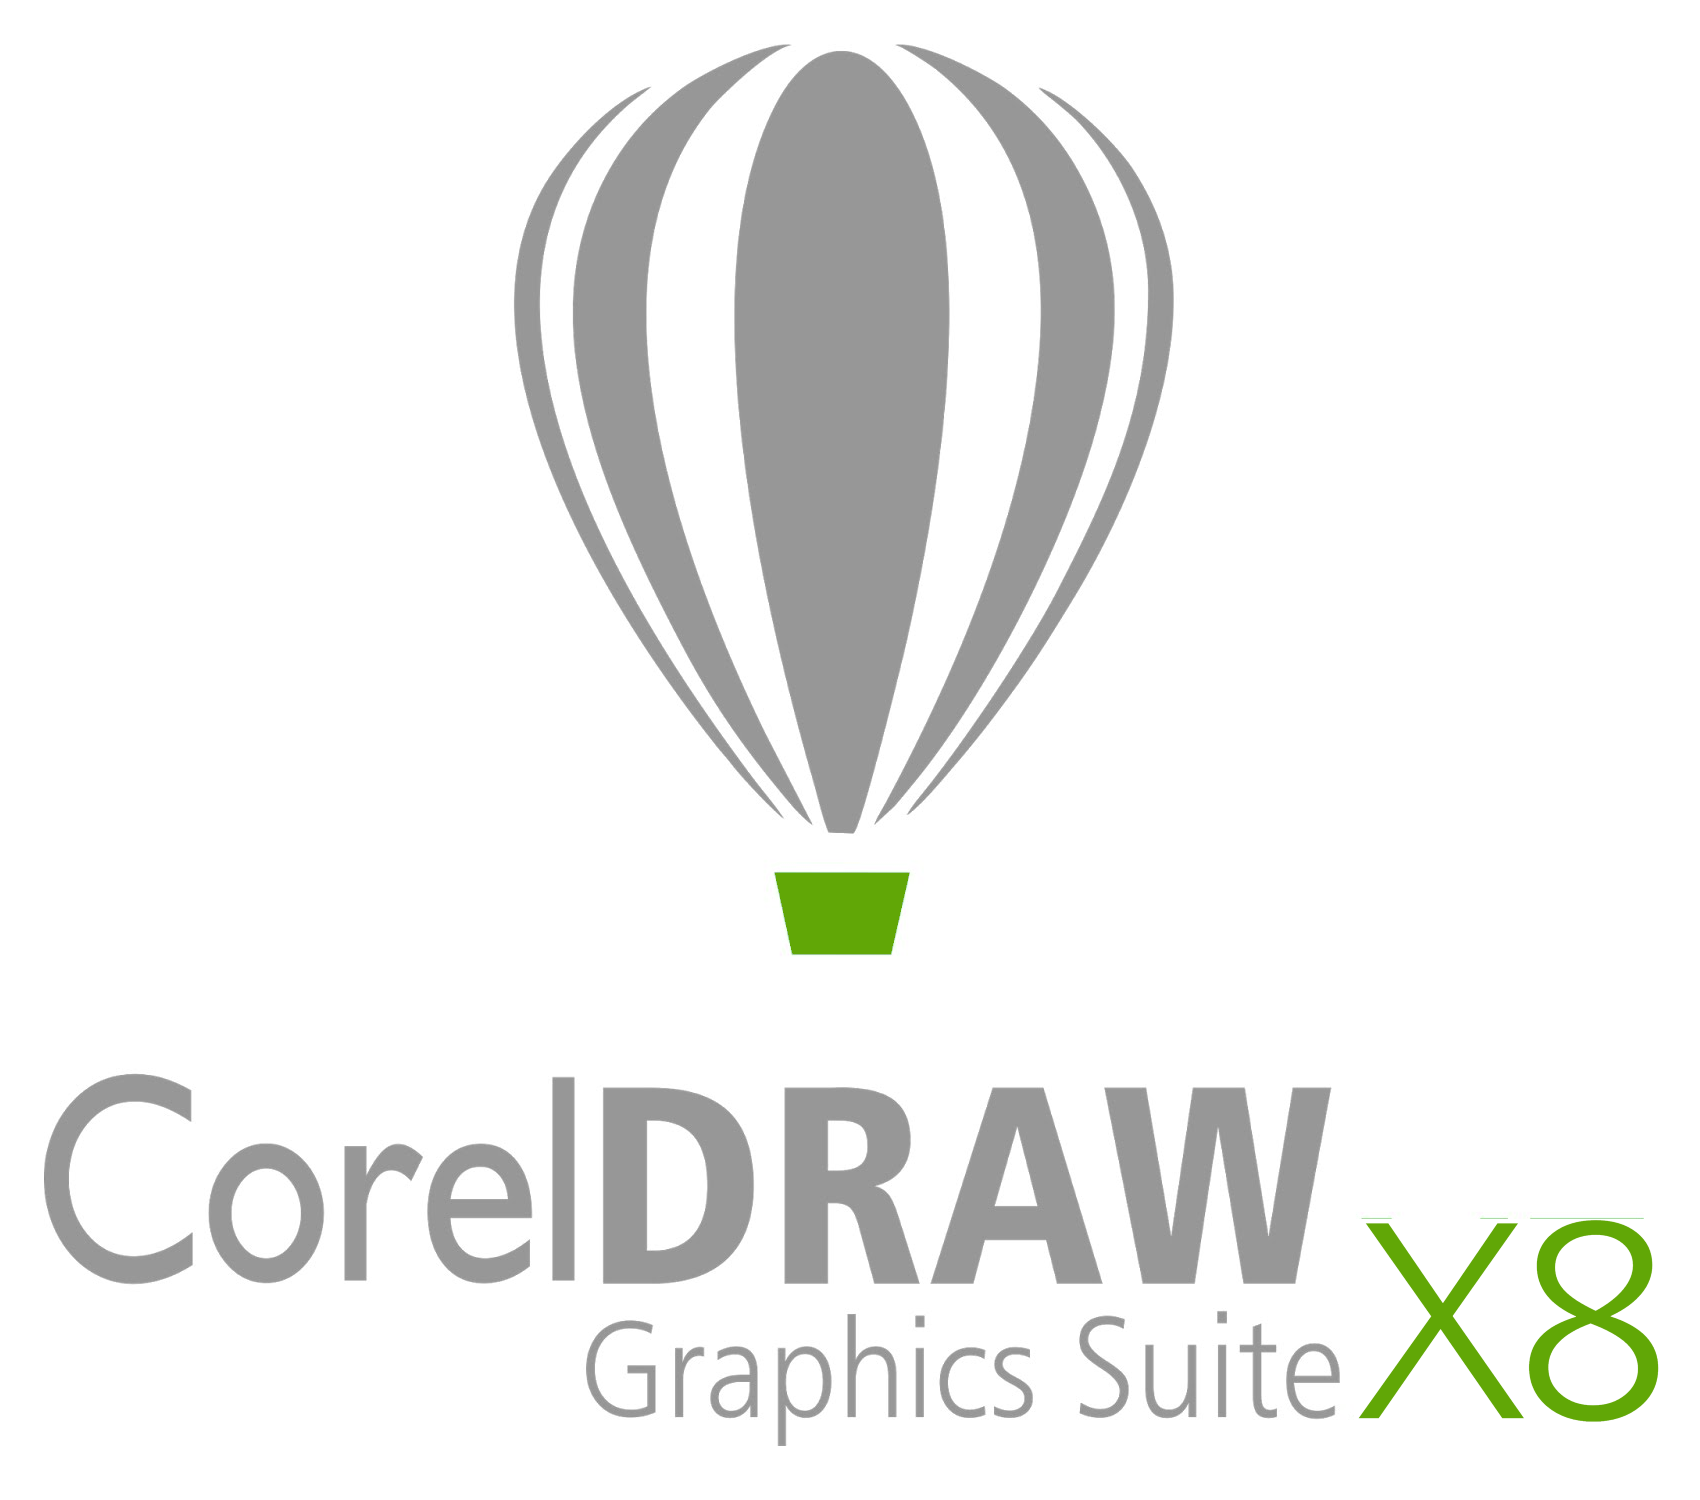 CorelDRAW – Logos Download